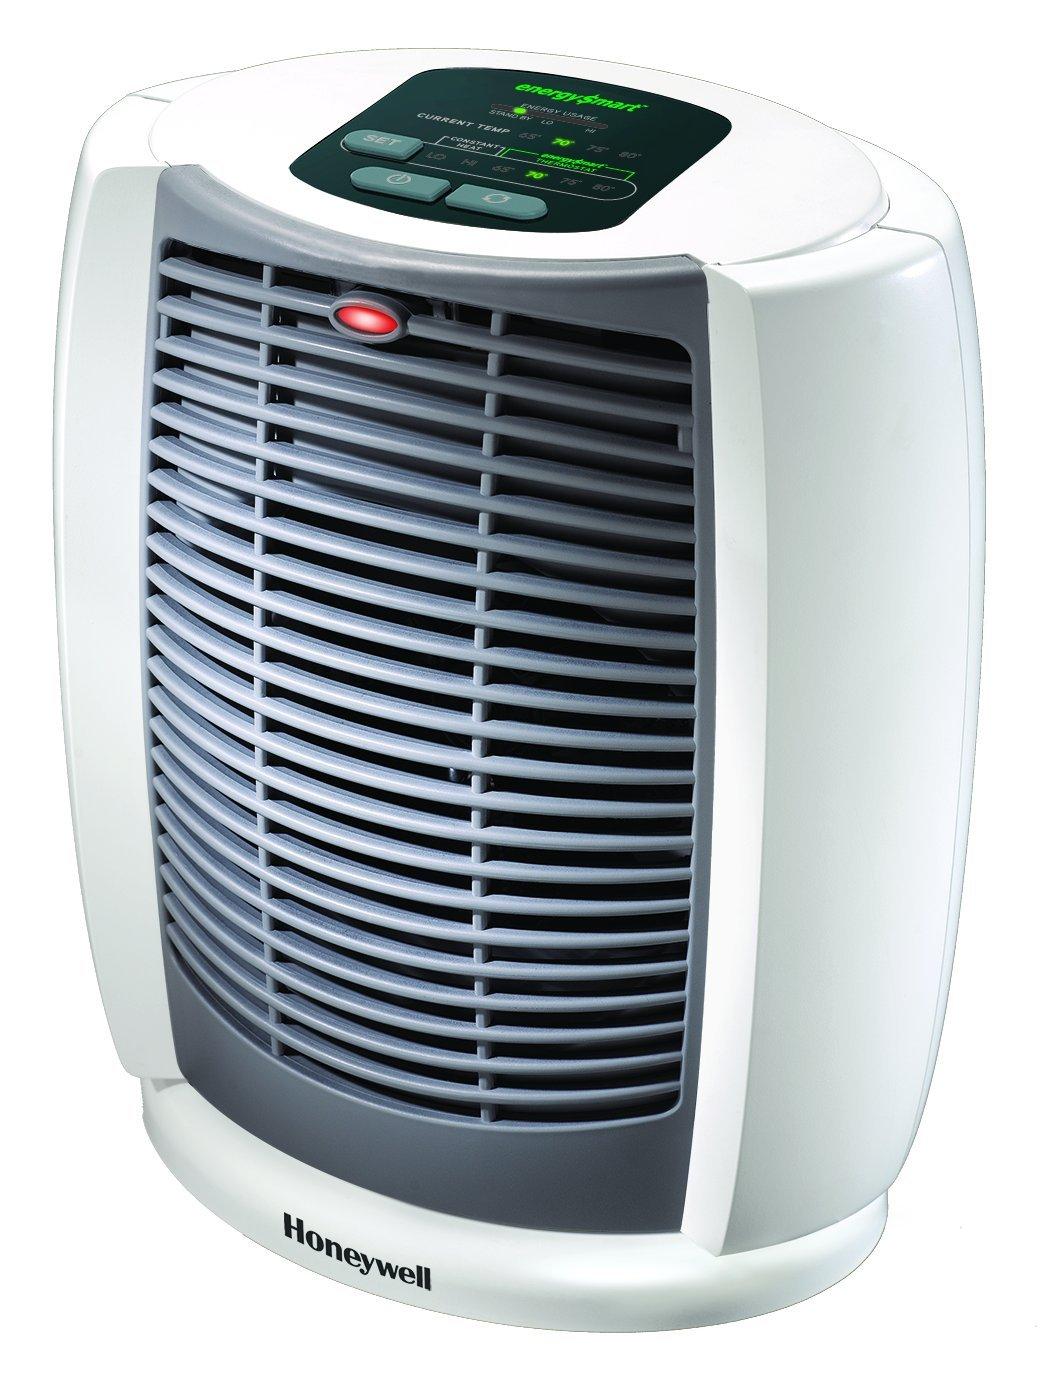 Honeywell HZ-7304U Deluxe EnergySmart Cool Touch Heater - White